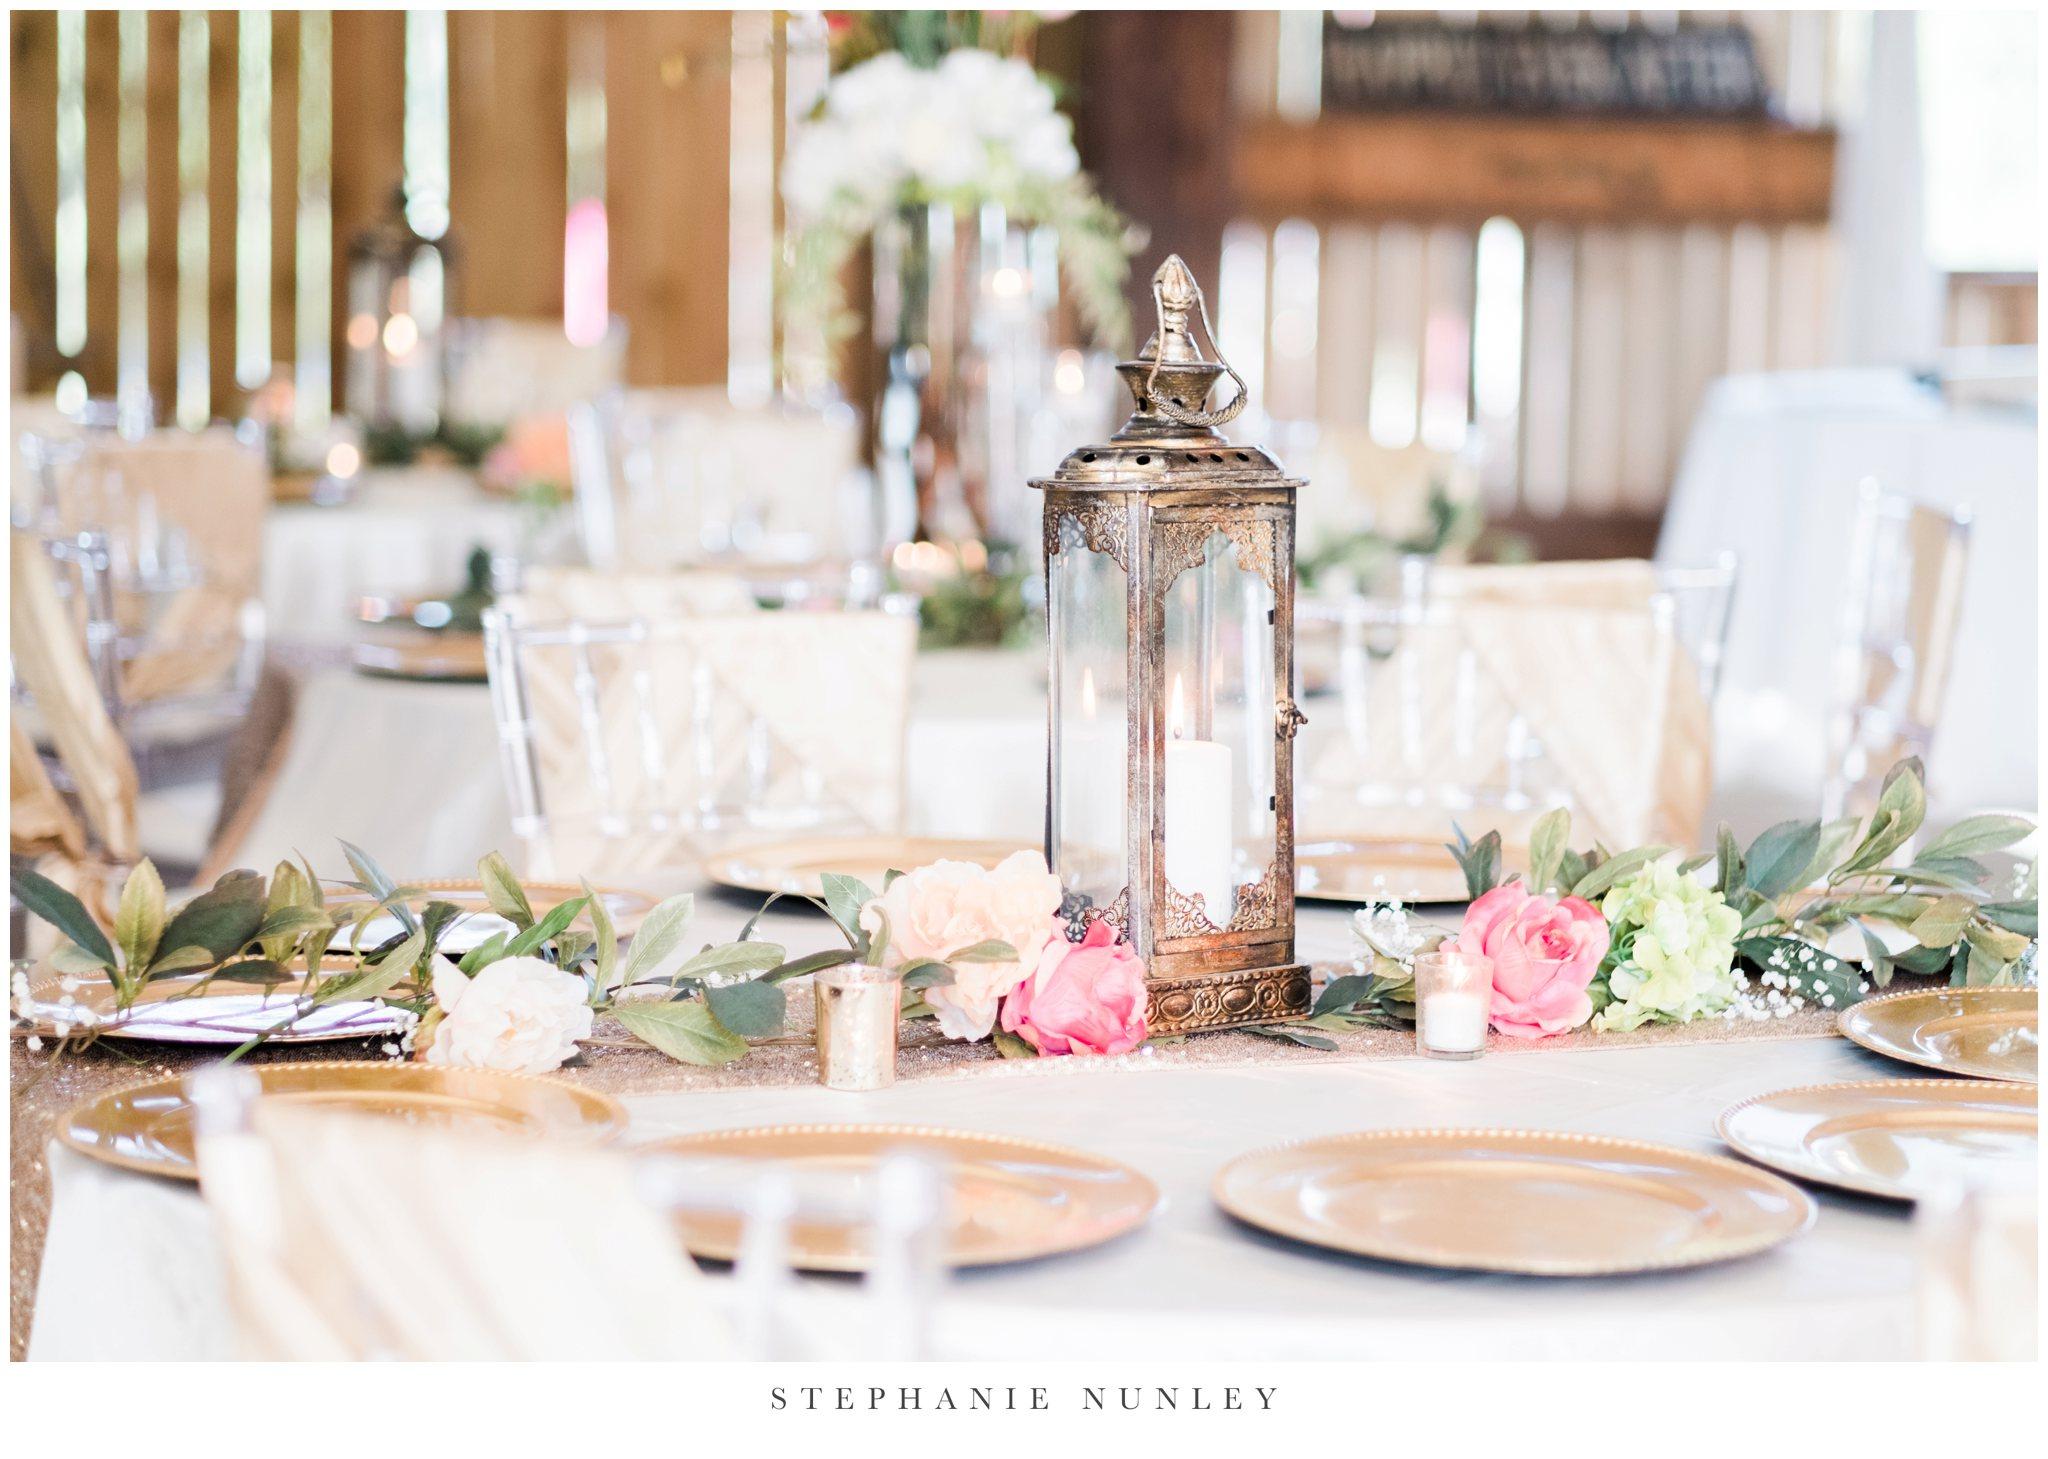 romantic-outdoor-wedding-with-flower-crown-0114.jpg